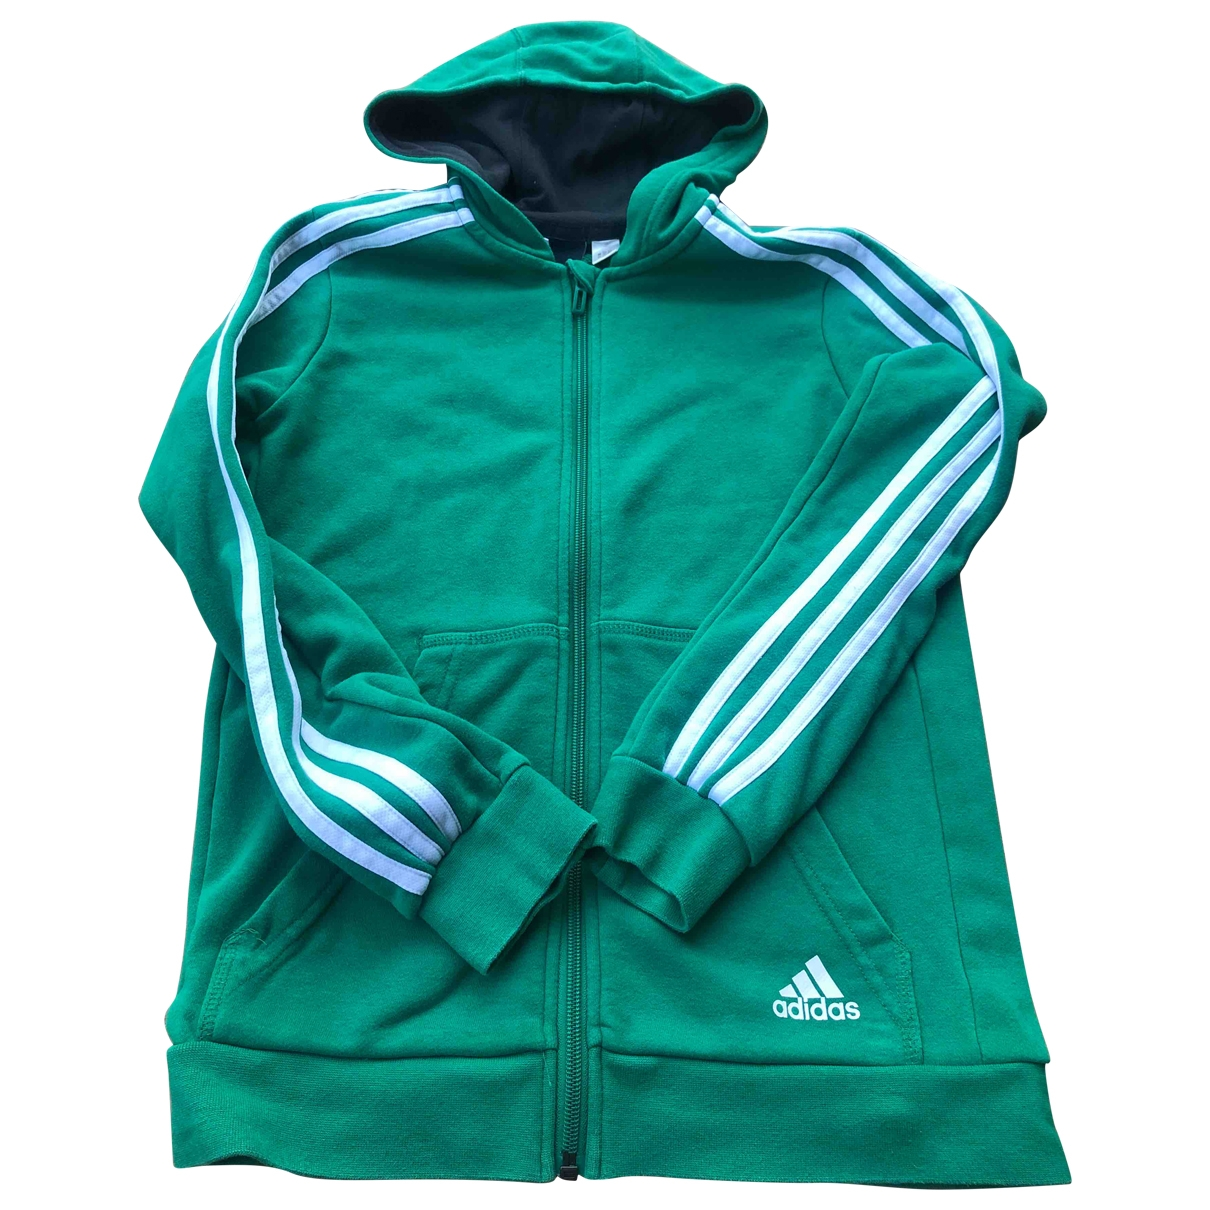 Adidas \N Pullover, StrickJacke in  Gruen Baumwolle